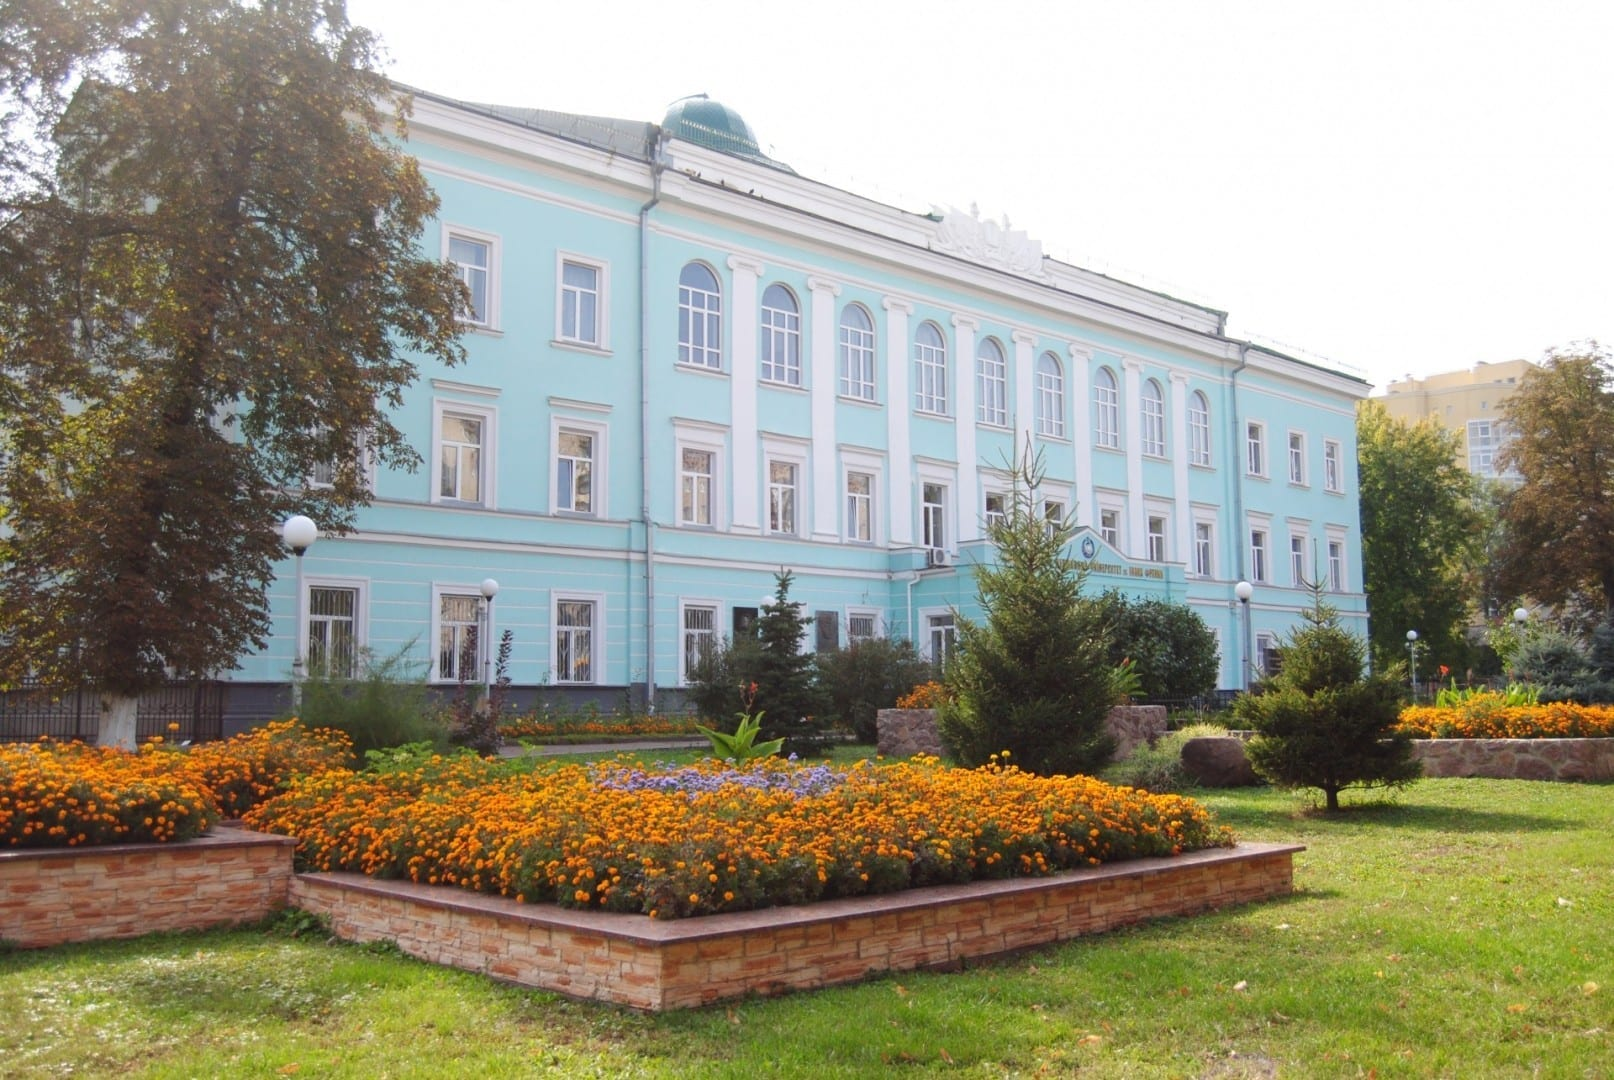 La antigua escuela secundaria, donde estudió Korolenko - escritor ruso, periodista. Zhytomir Ucrania